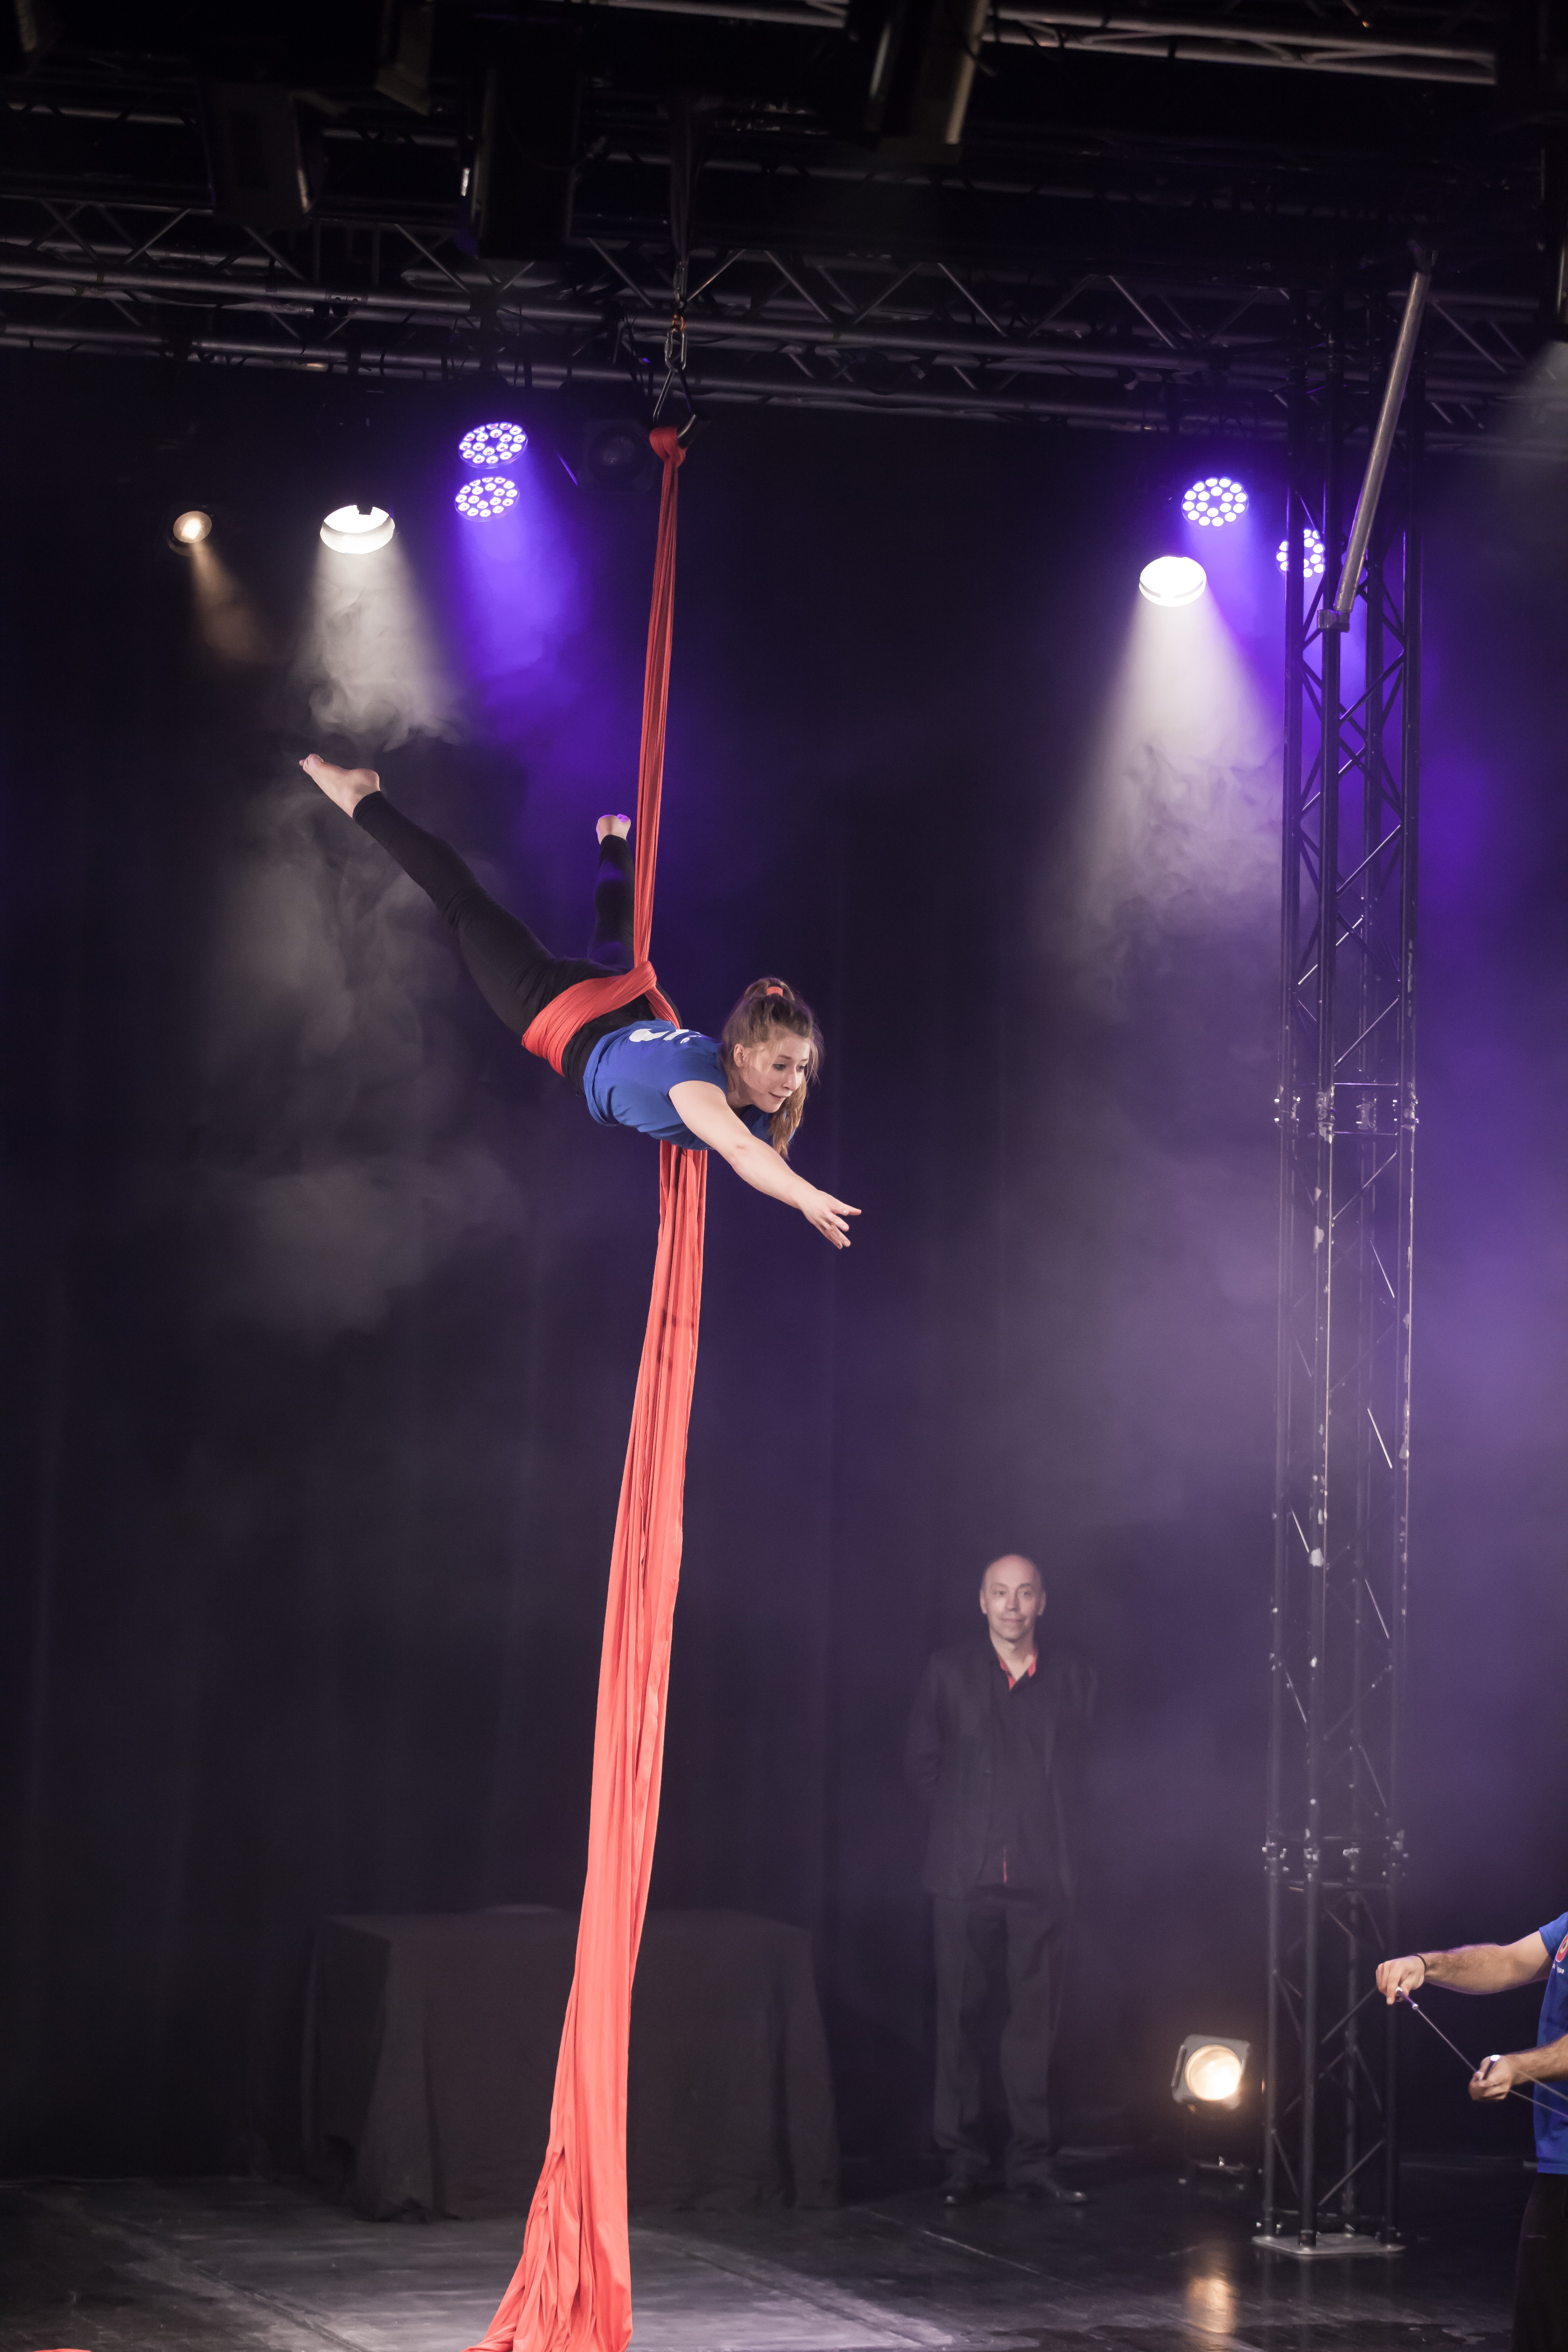 170701-battle-cirque-jdufresne-108_34993202274_o